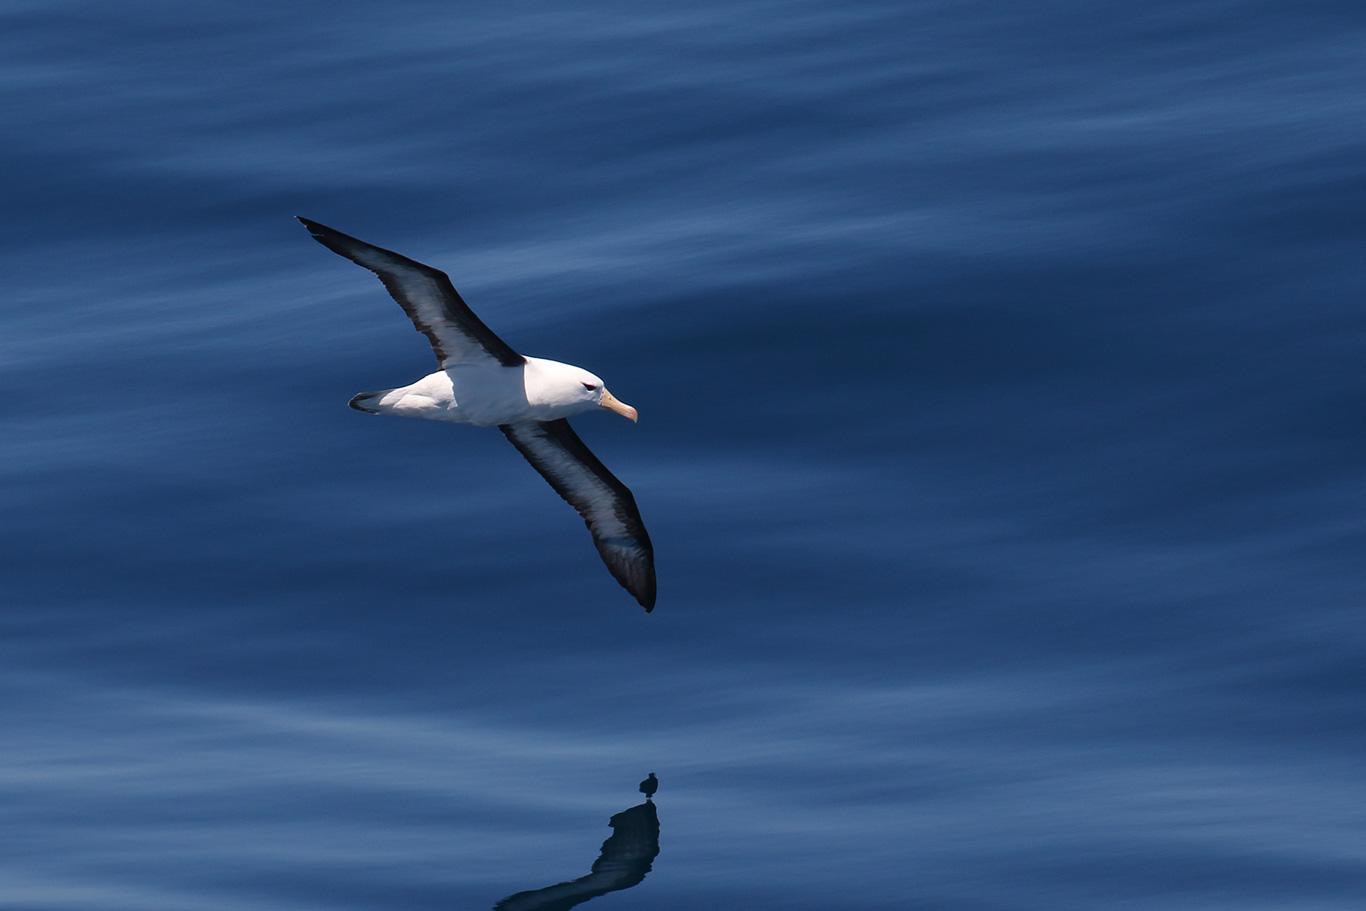 Black-browed Albatross, At sea, c. 600km east of Argentina, north of The Falklands, South Atlantic Ocean.